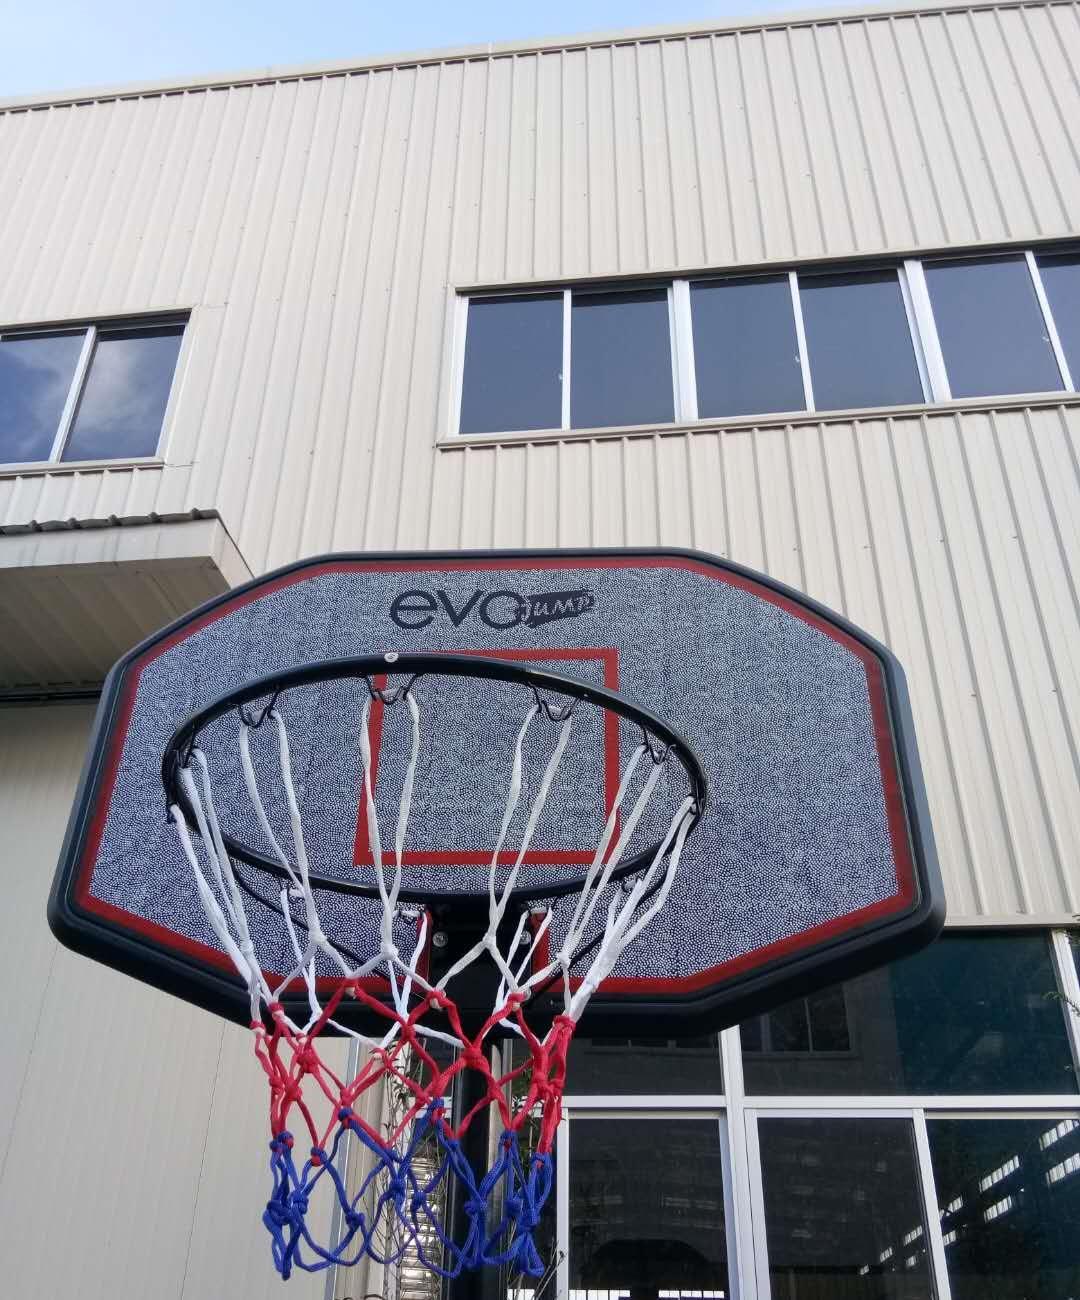 Мобильная баскетбольная стойка EVO JUMP CD-B001